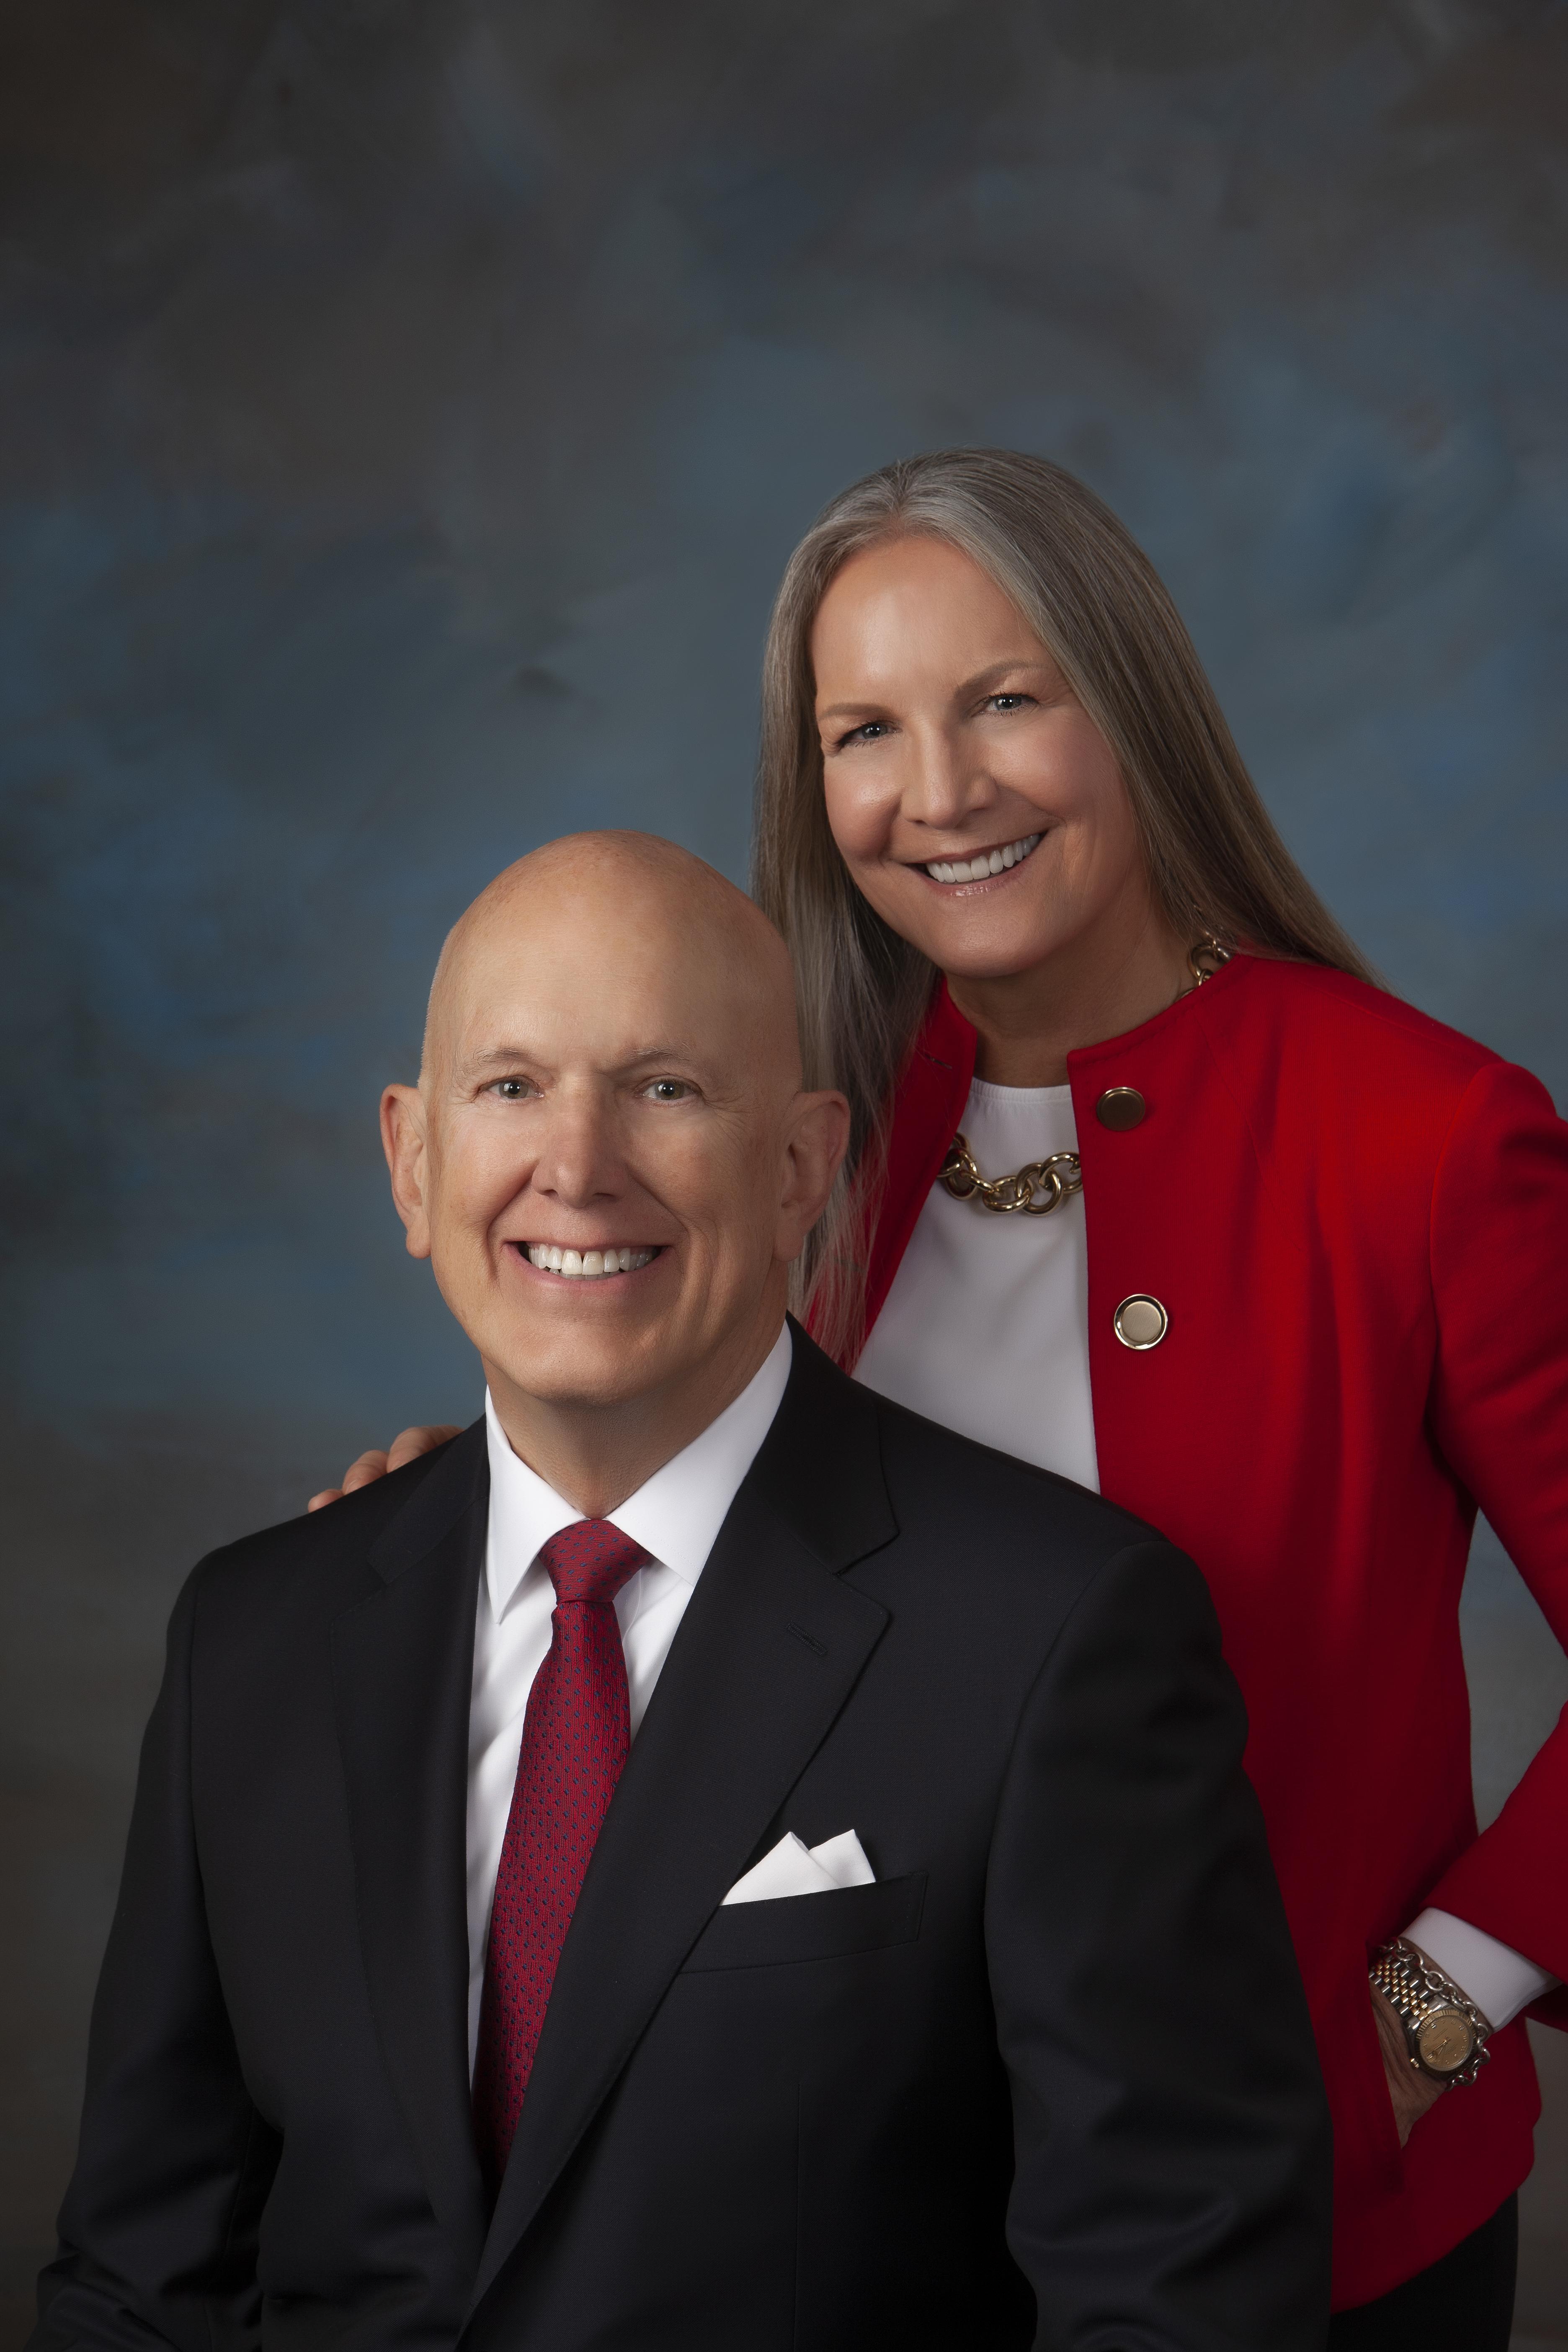 John Stephen Rizley and Marilyn Marie Berg Rizley